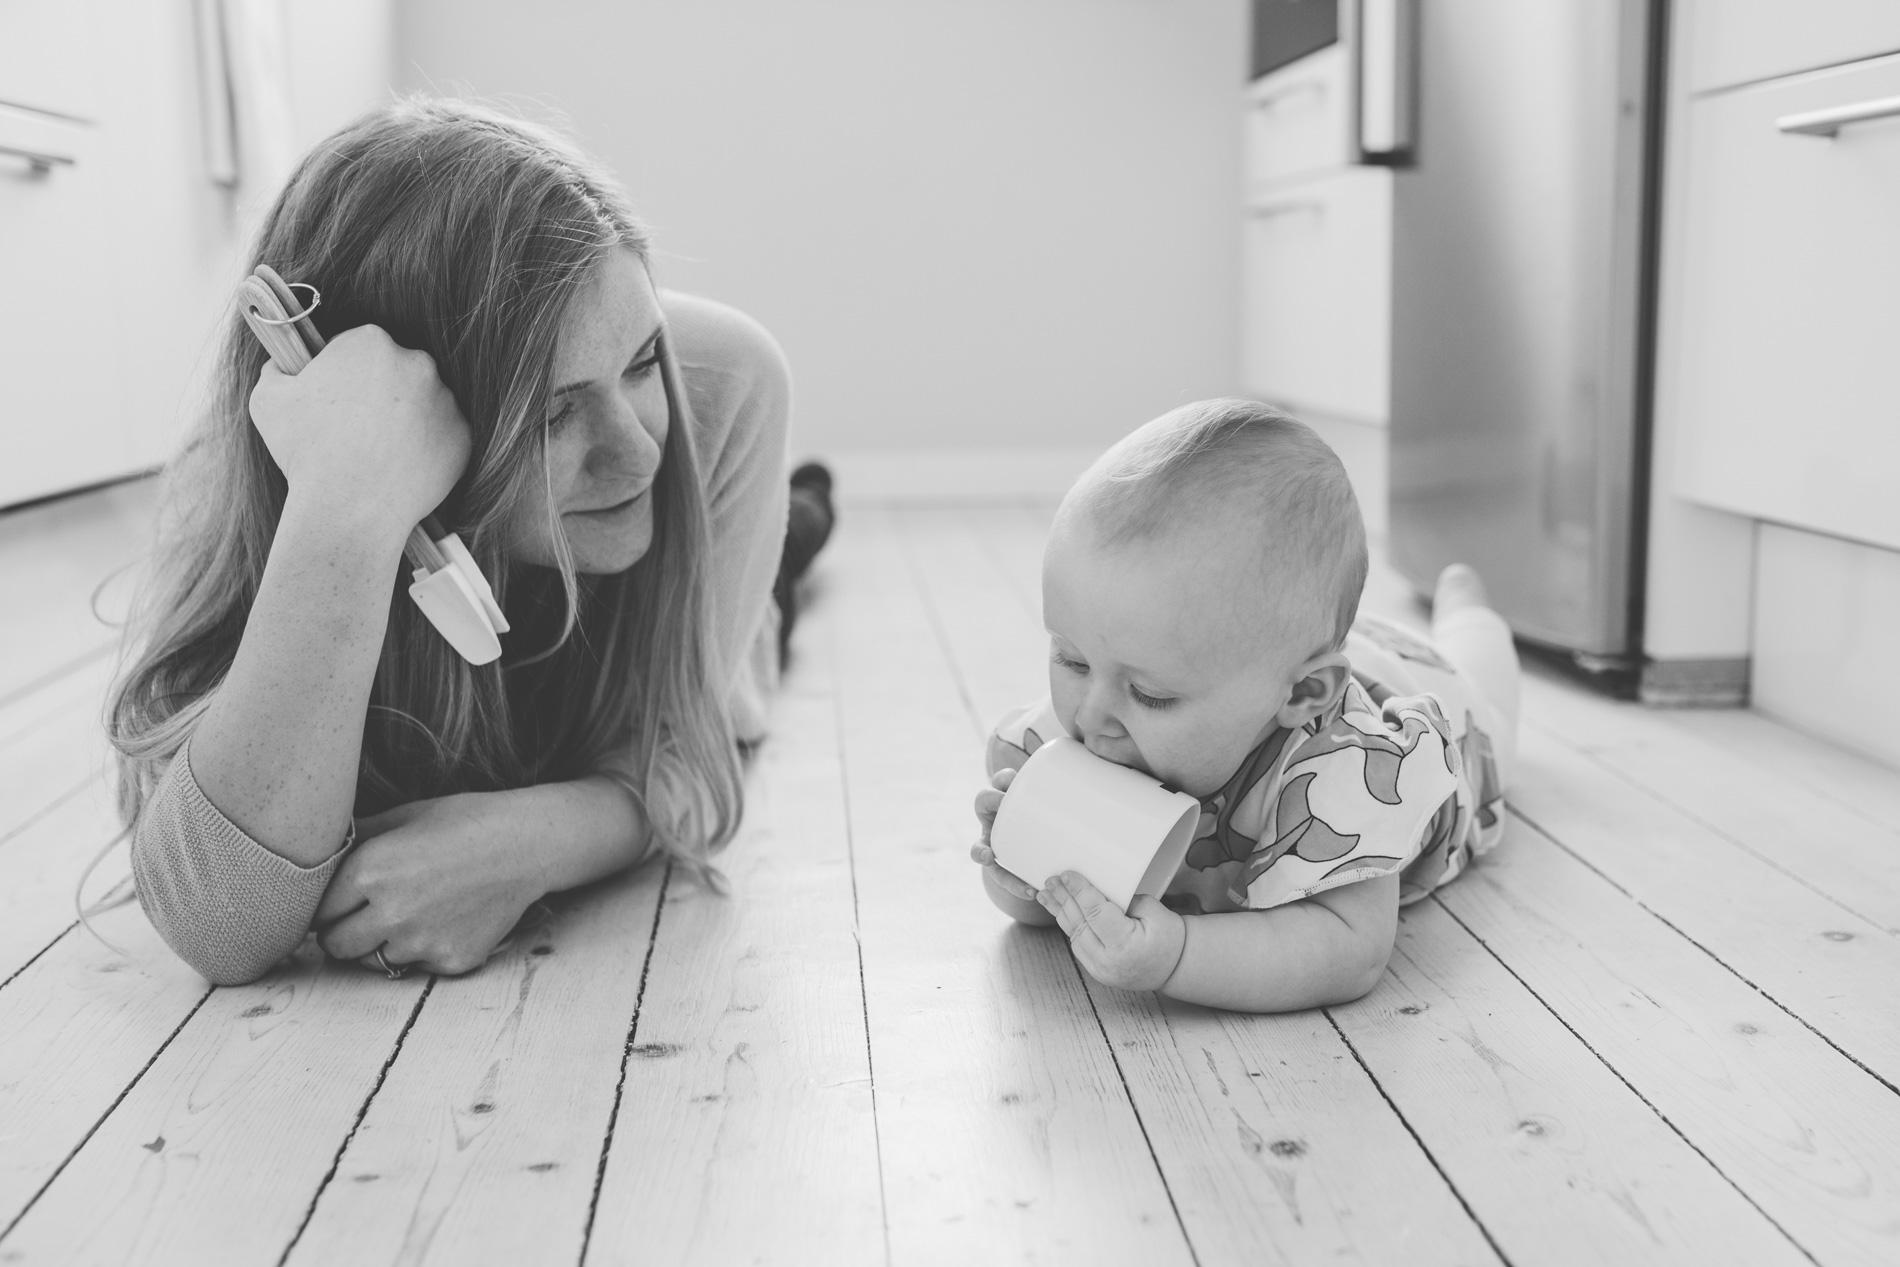 hur fotar man bebisar-lifestylefotografering i nacka